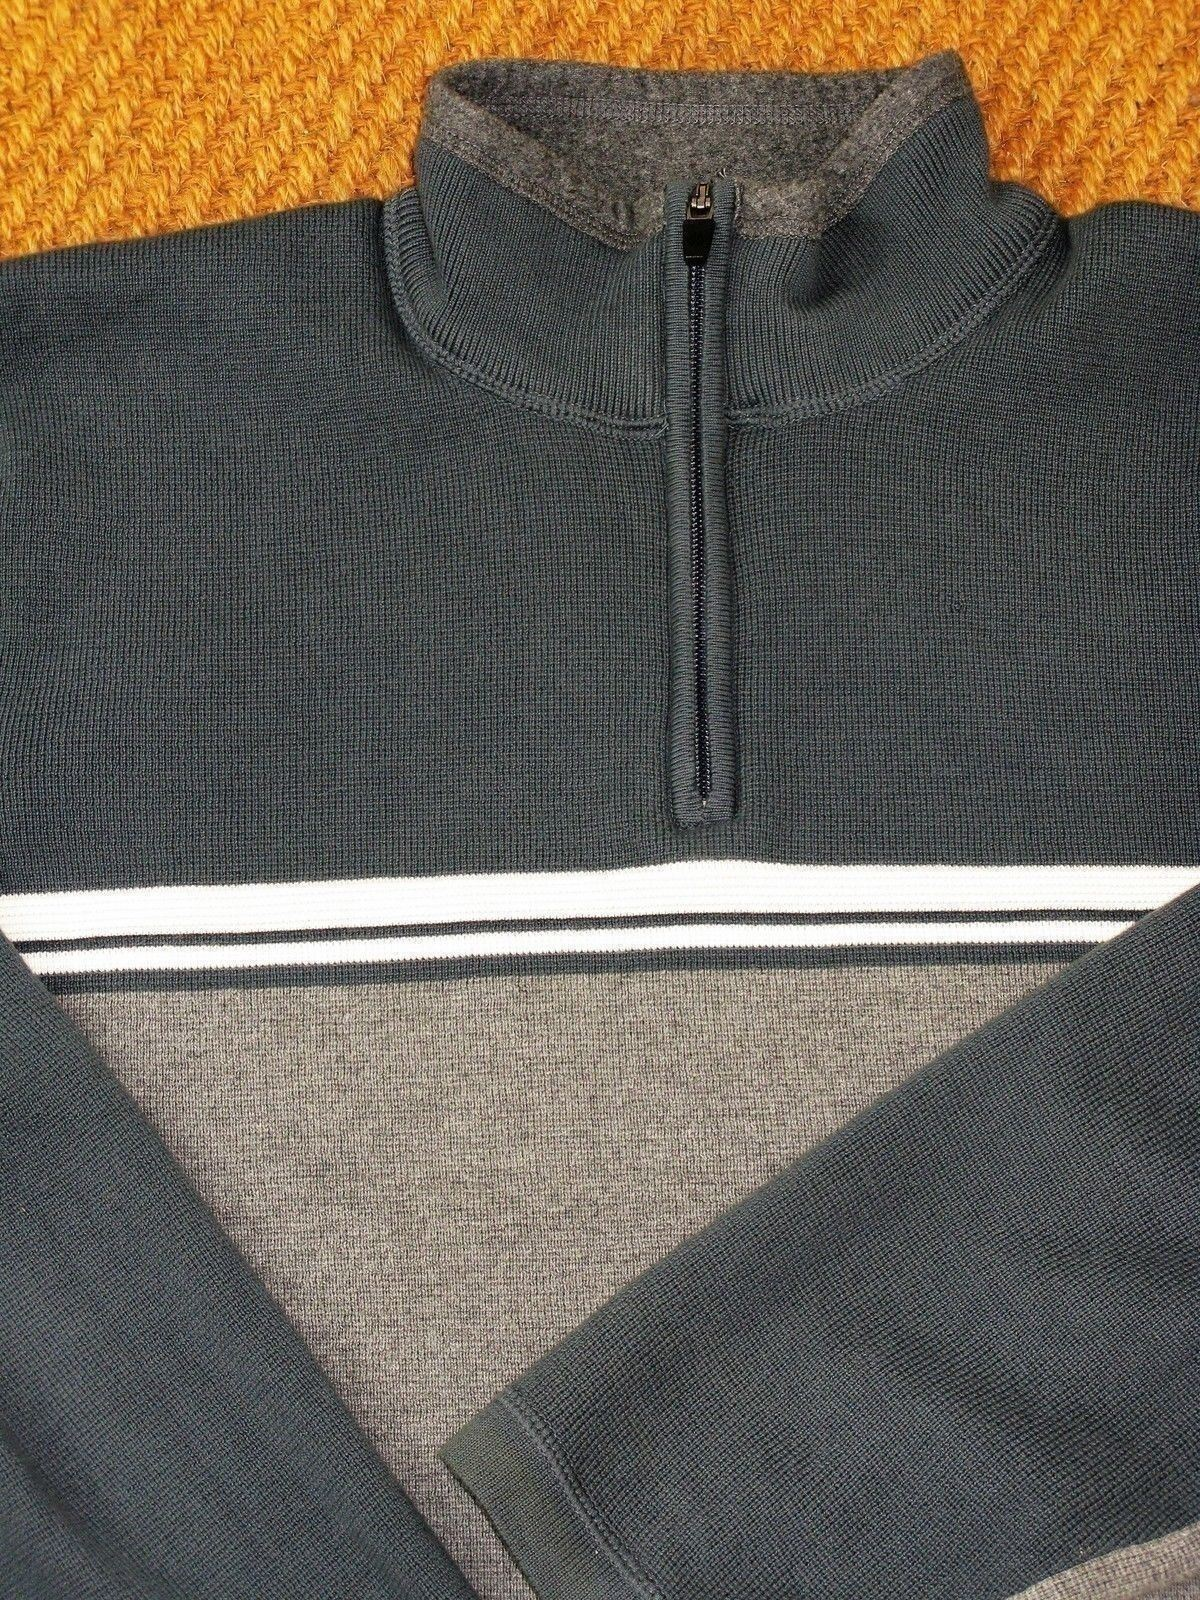 Pullover Sweater Eddie Bauer 1/4 Zip Pullover Cotton Knit Sweater L $88 MSRP